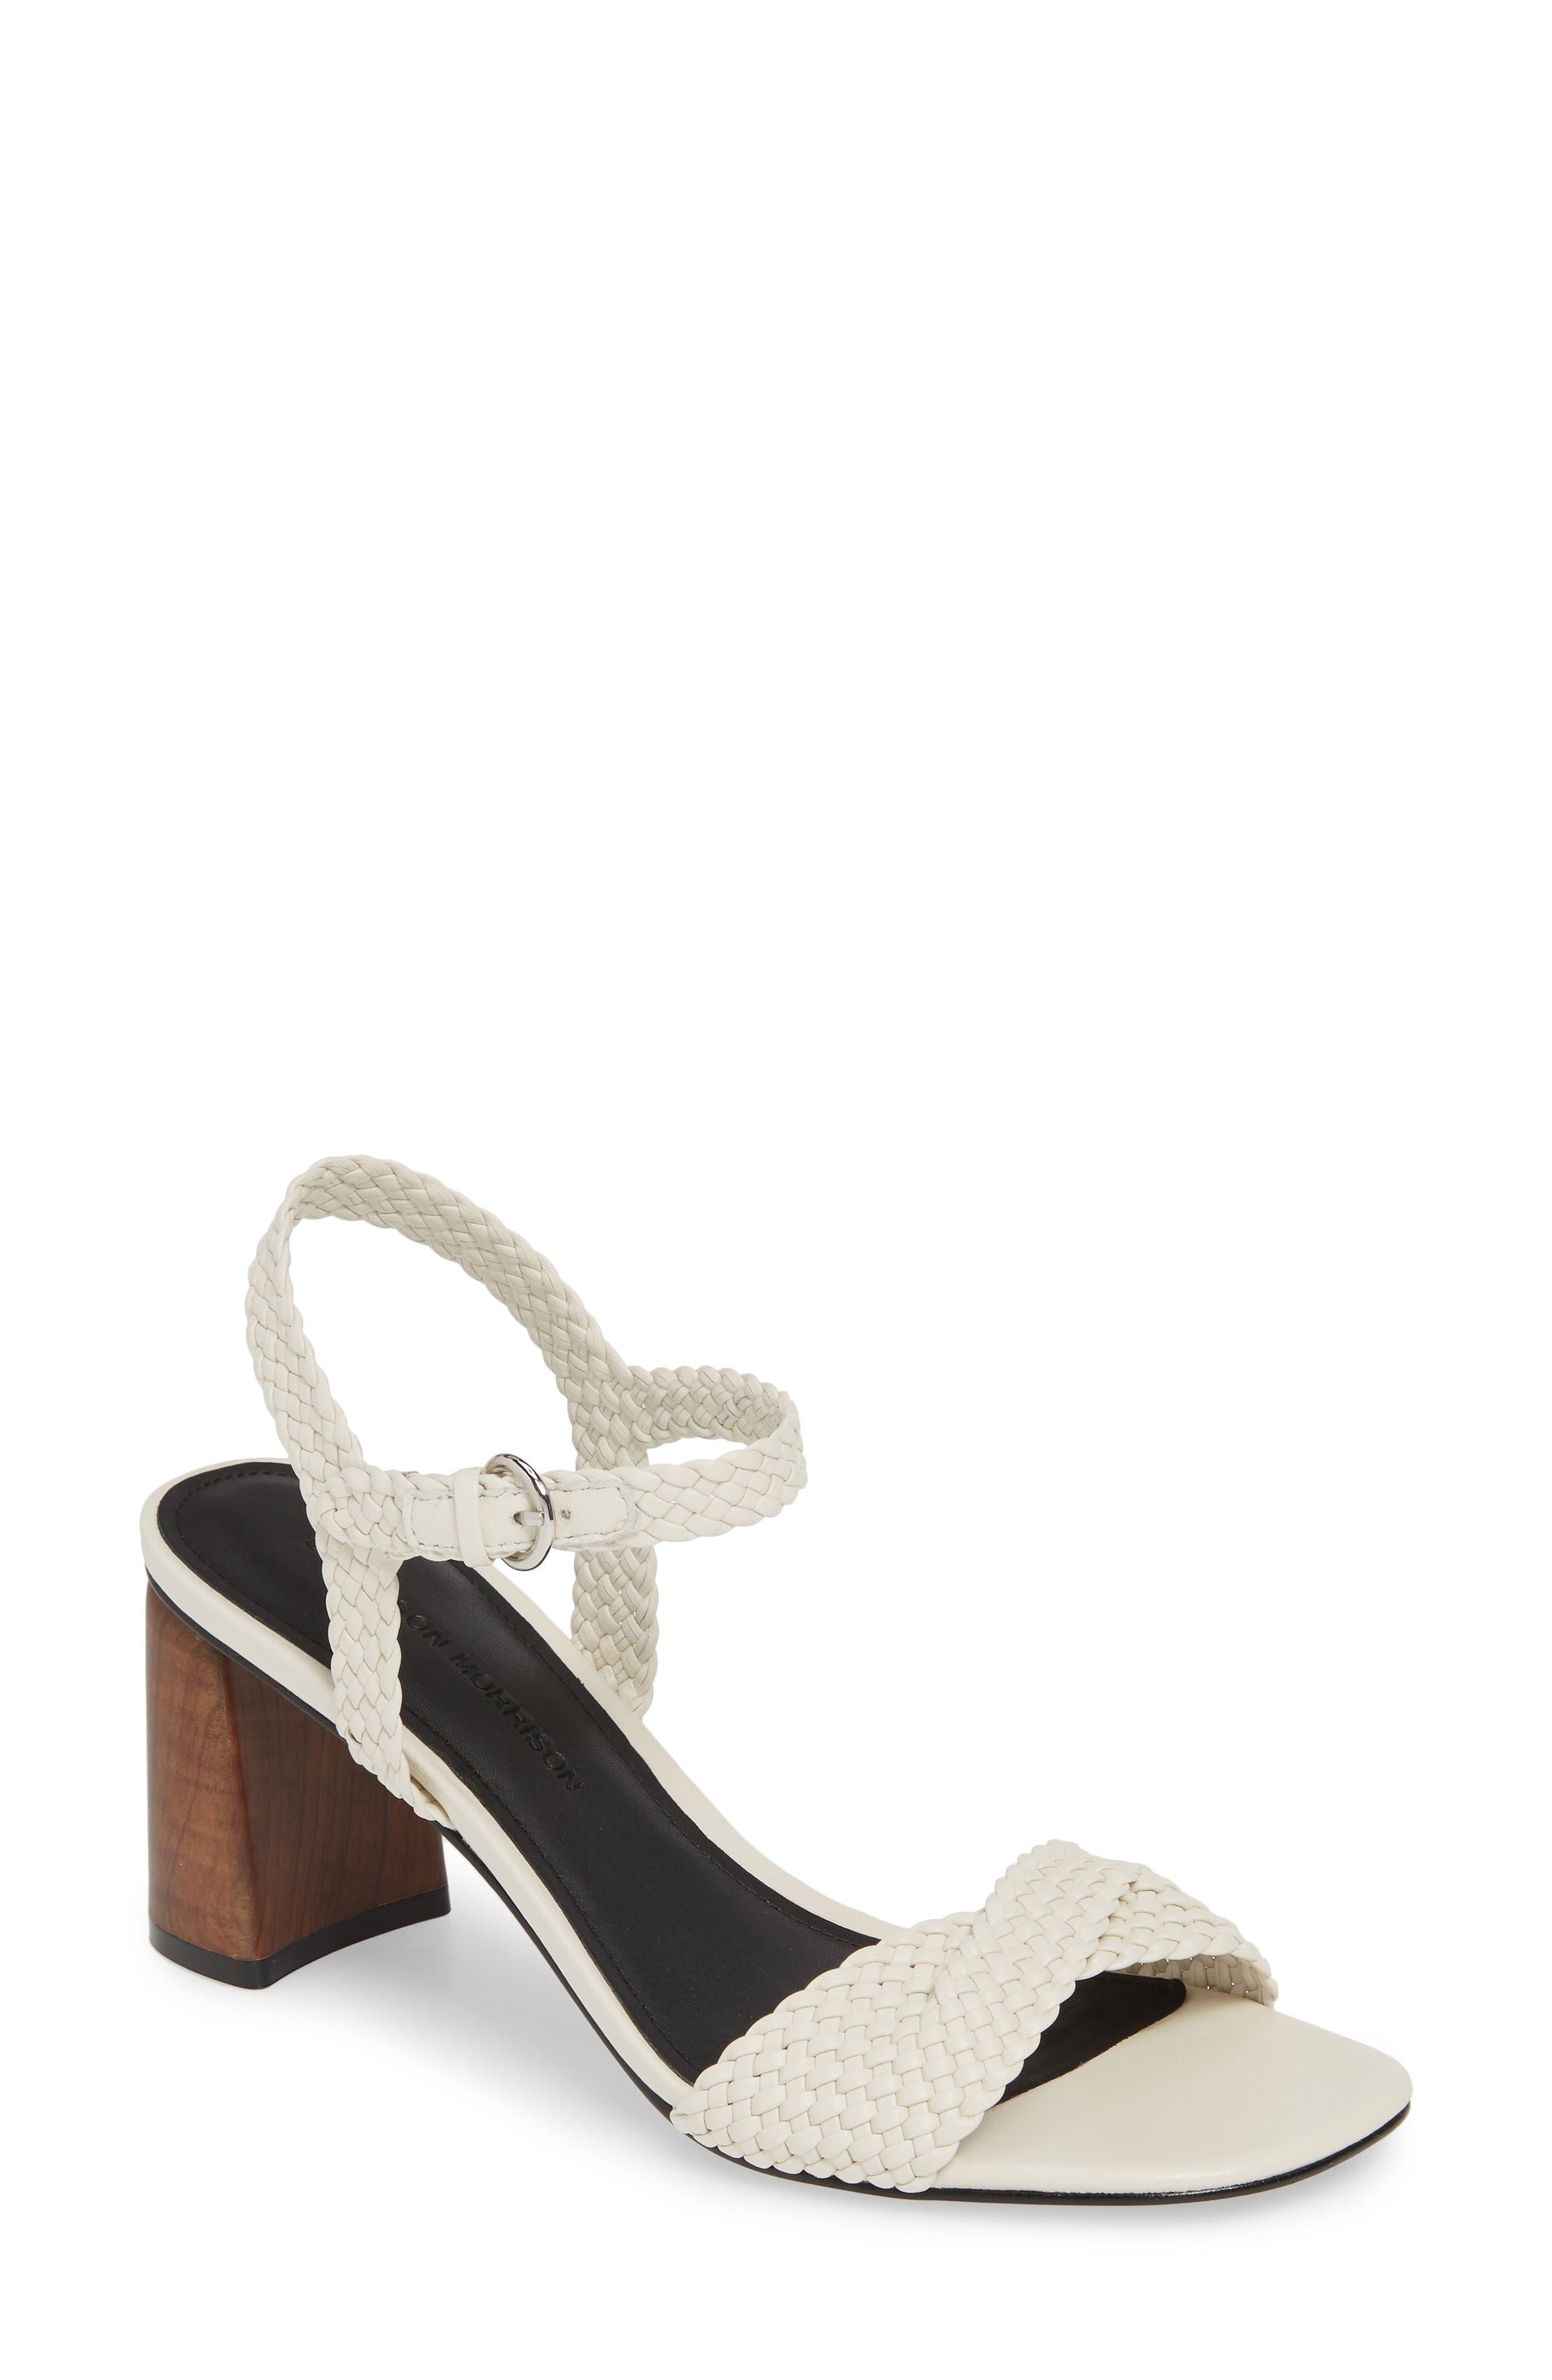 Sigerson Morrison Darby Woven Sandal White